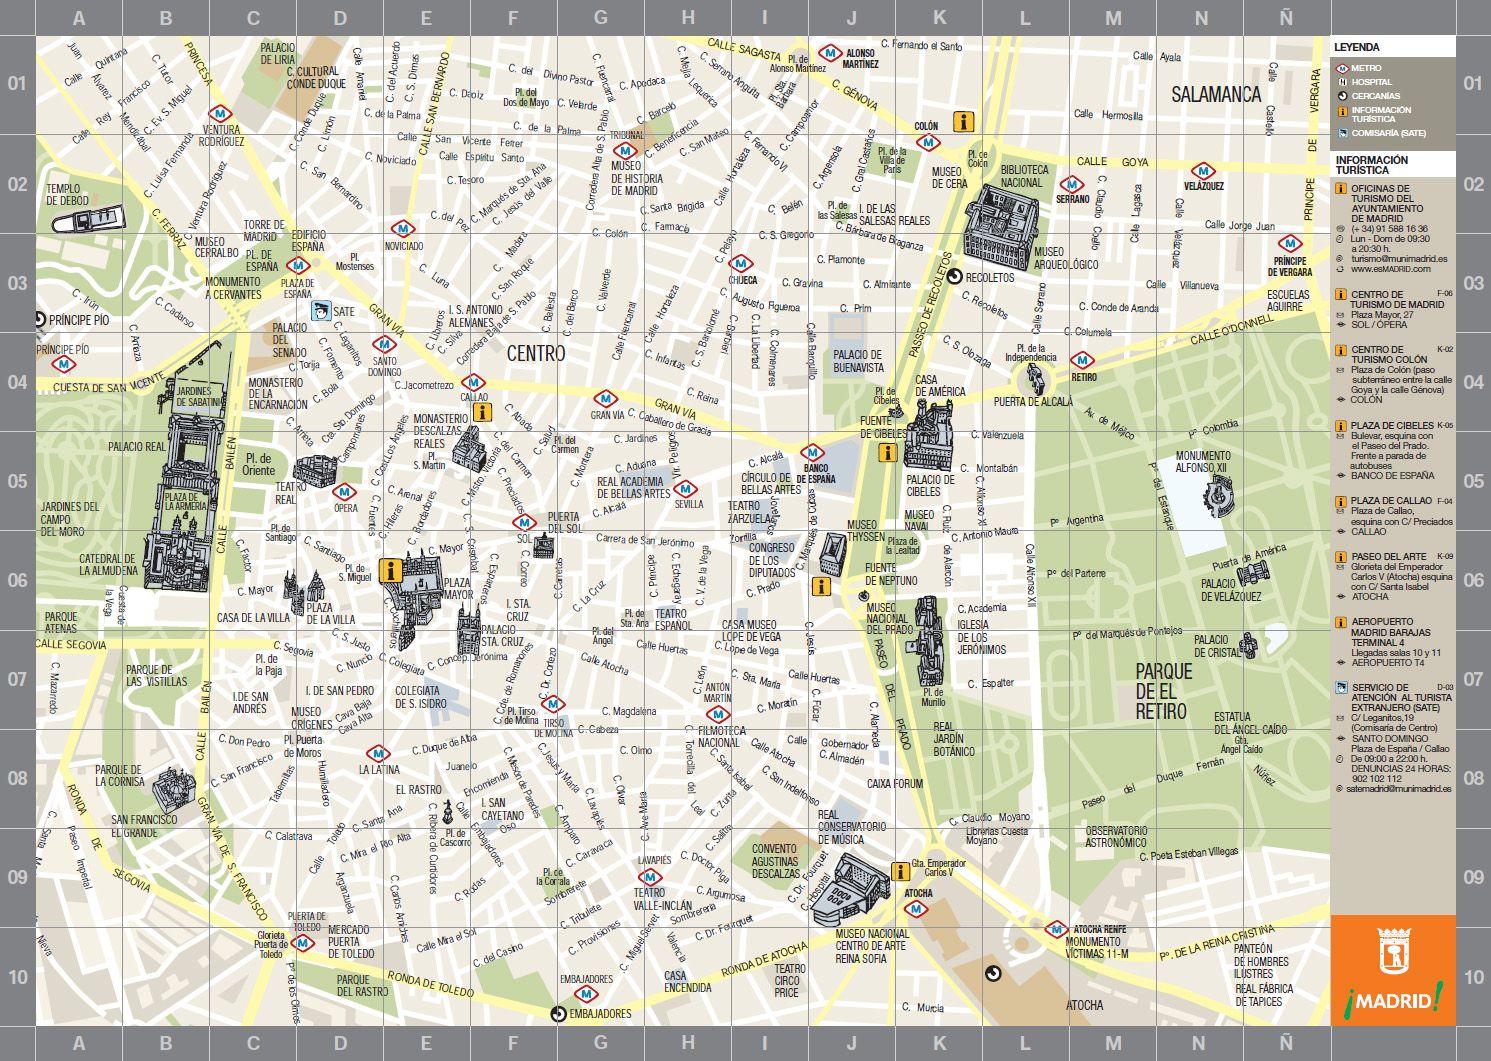 Mapa Centro De Madrid.Mapa Turistico De Madrid Pincha Para Verlo Ampliado